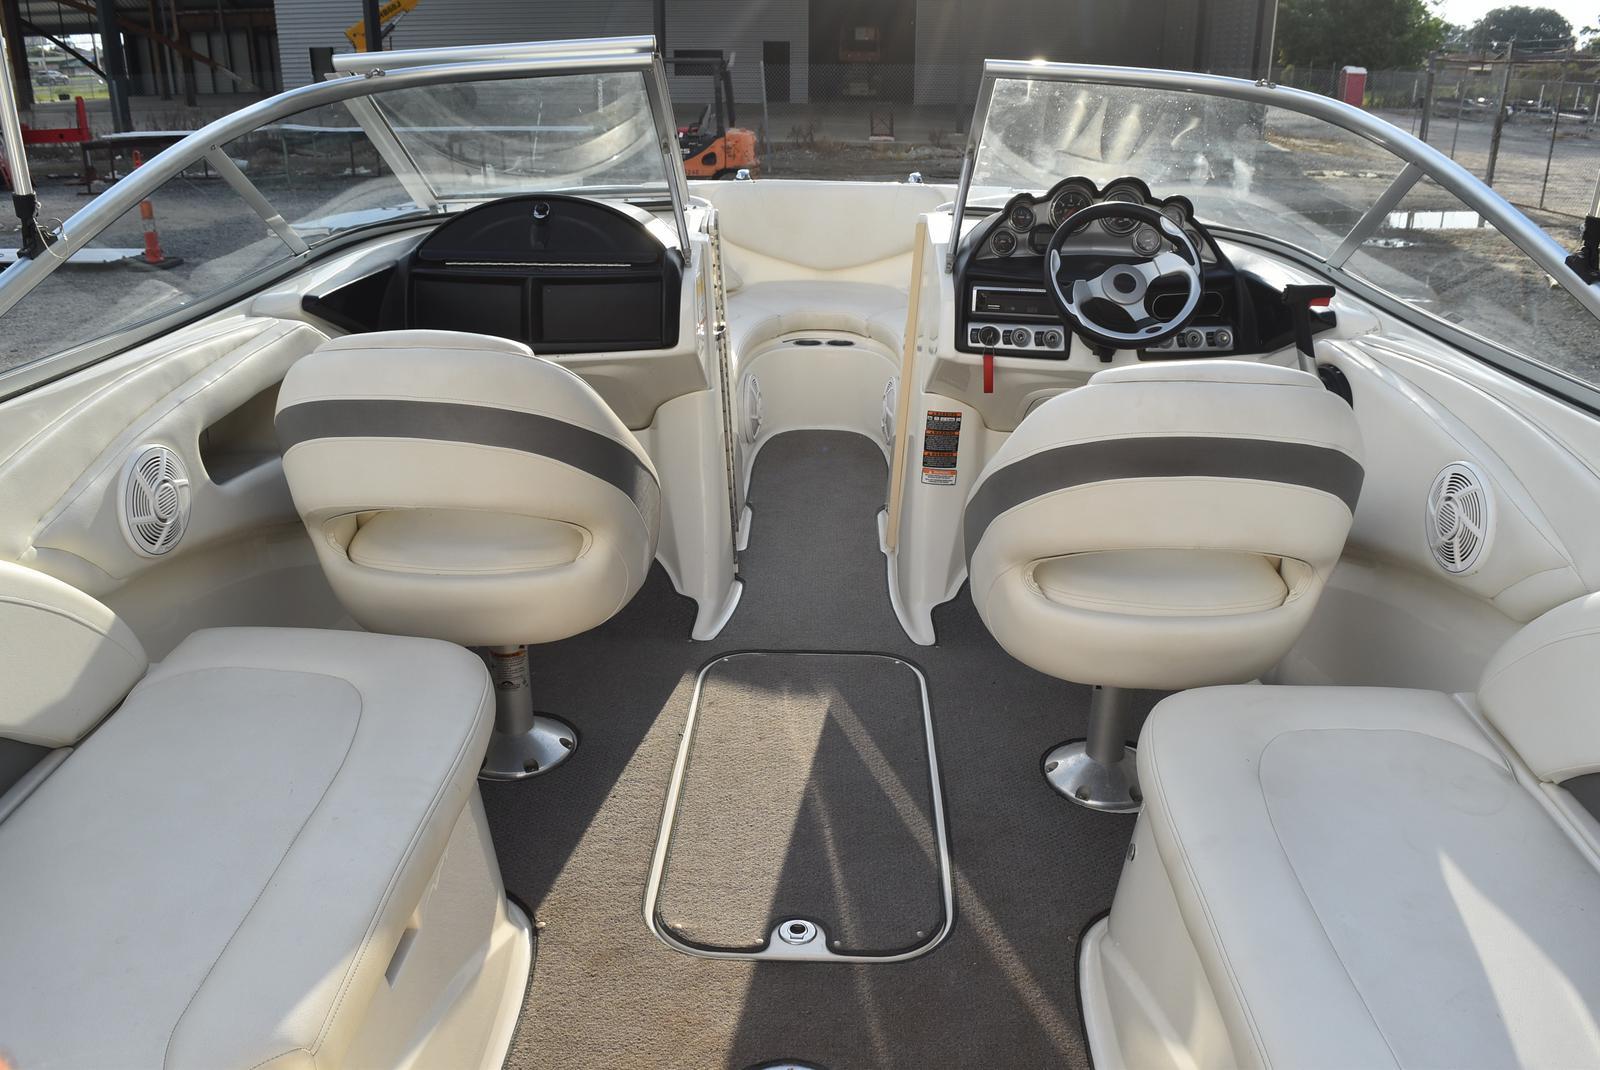 2010 Bayliner boat for sale, model of the boat is 235BR & Image # 16 of 43